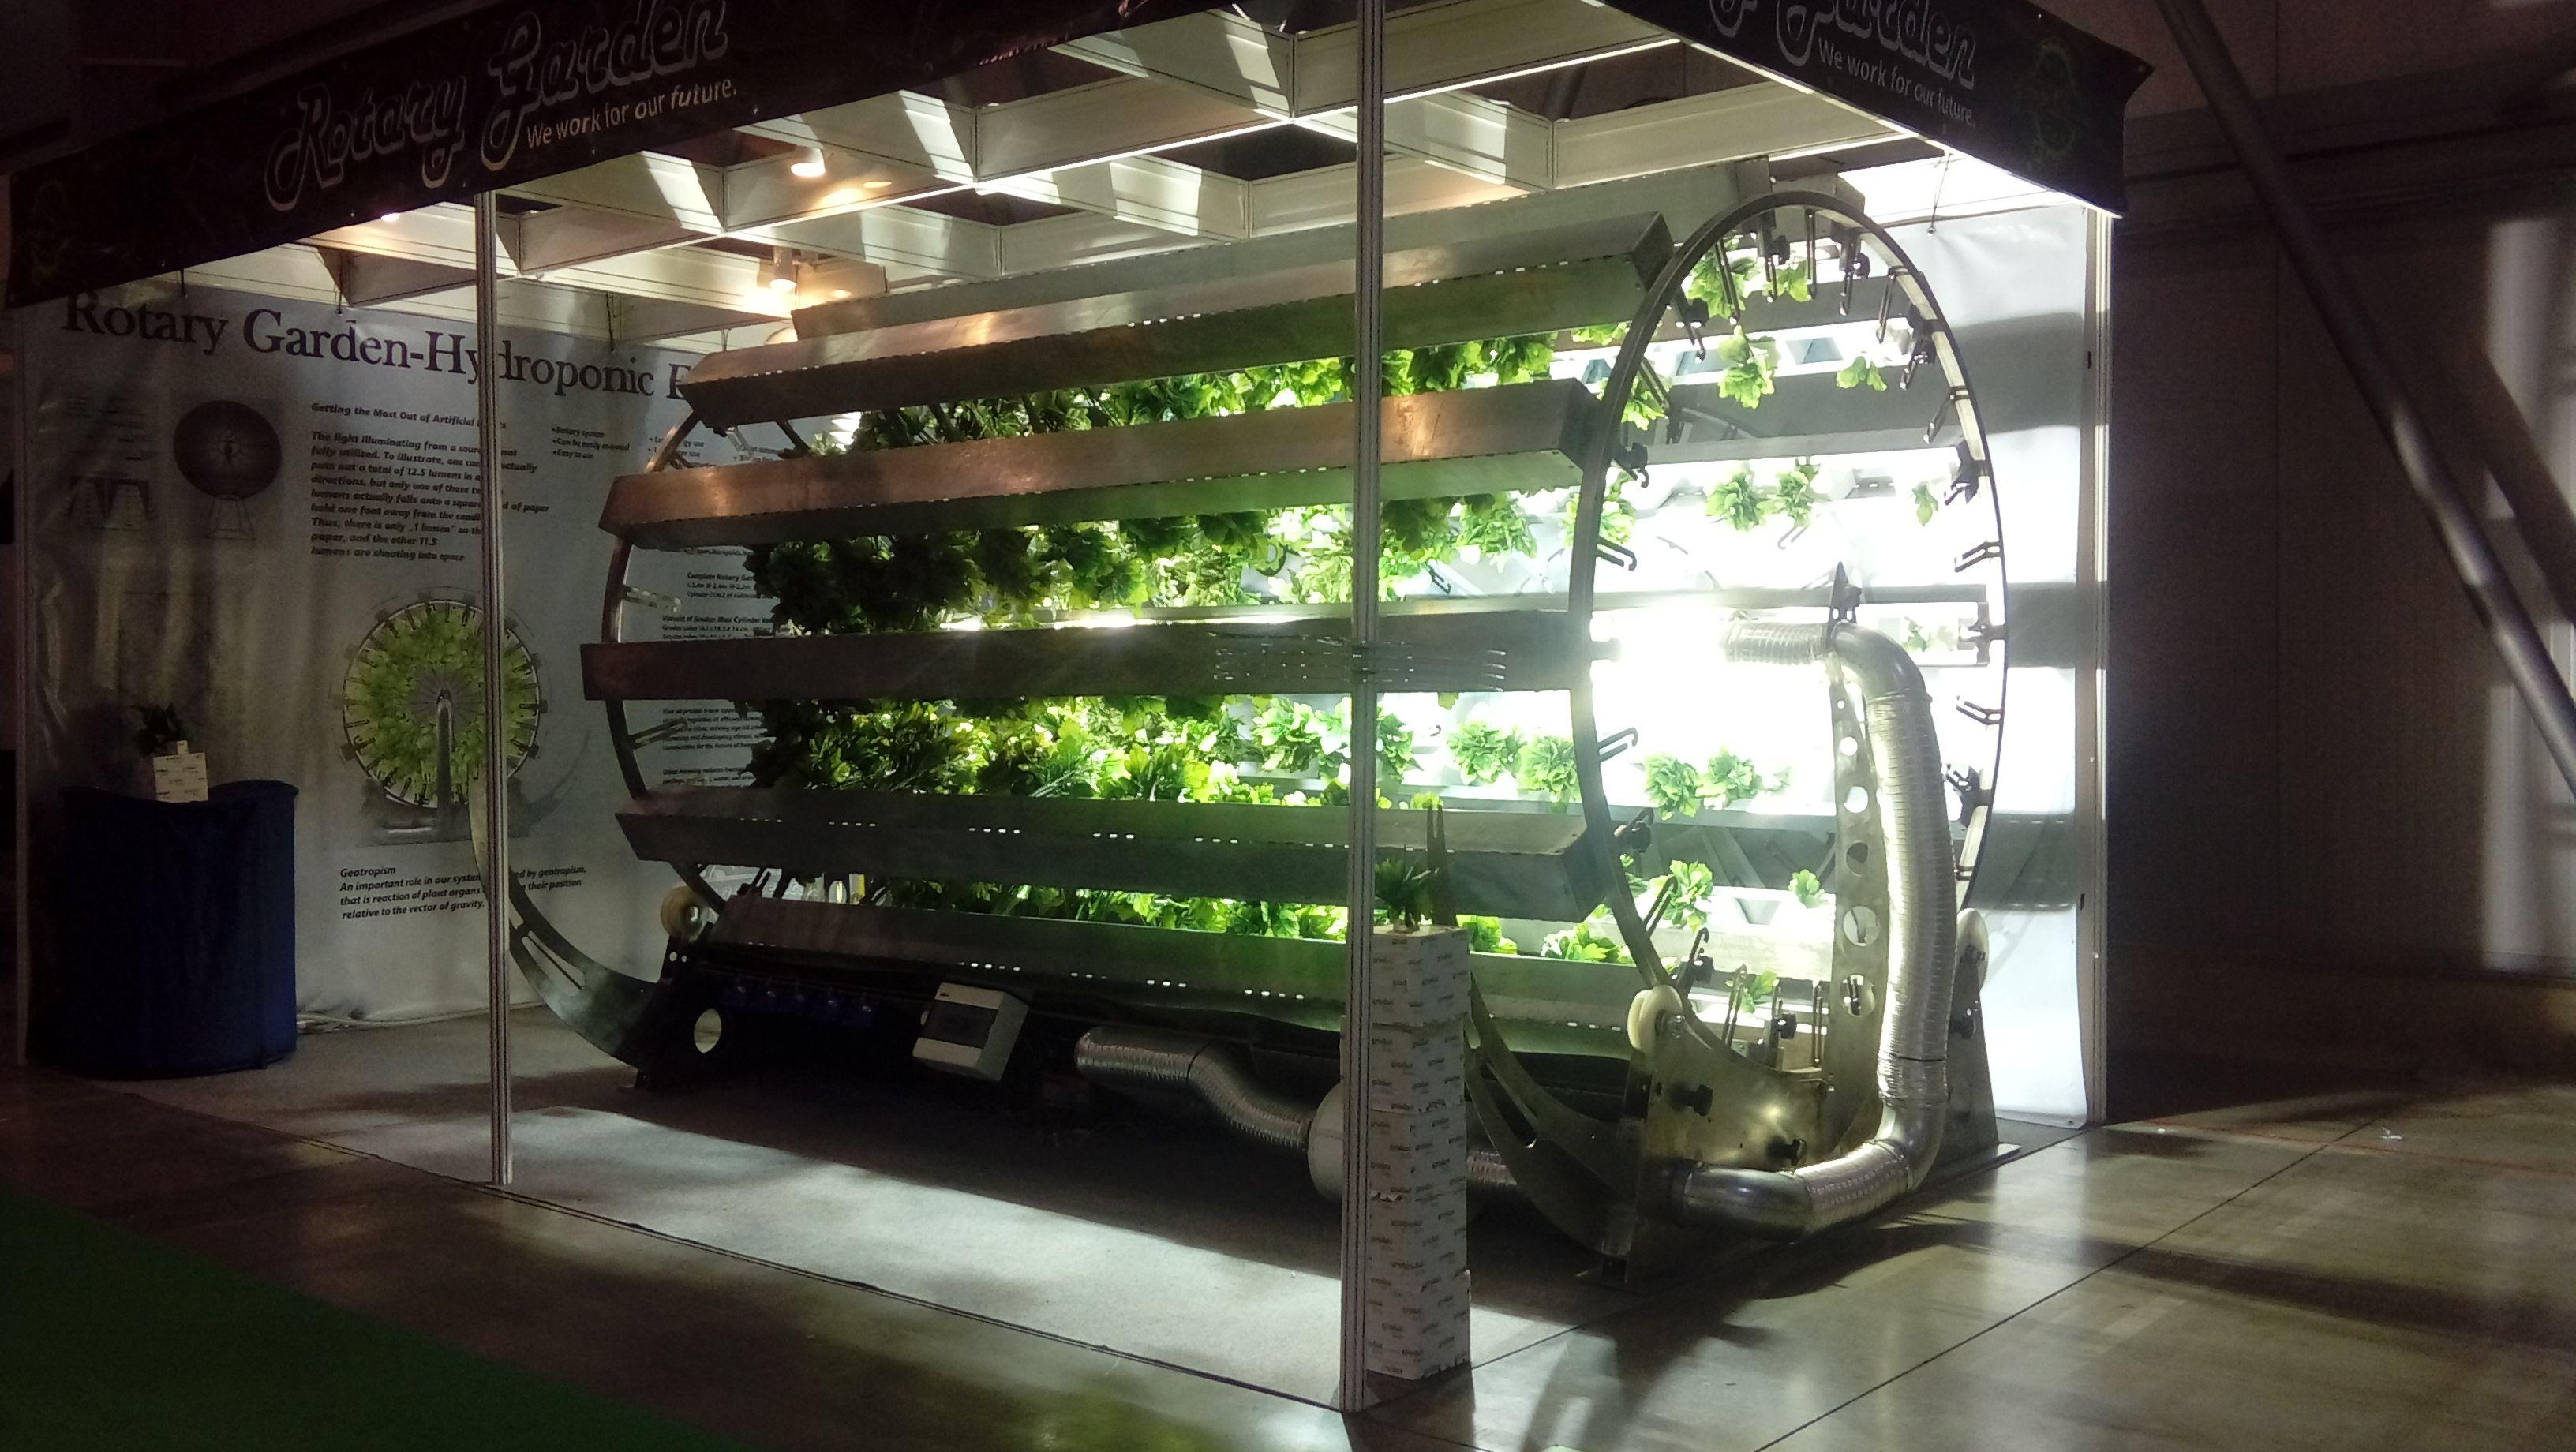 Garage rotary garden AGT VZW